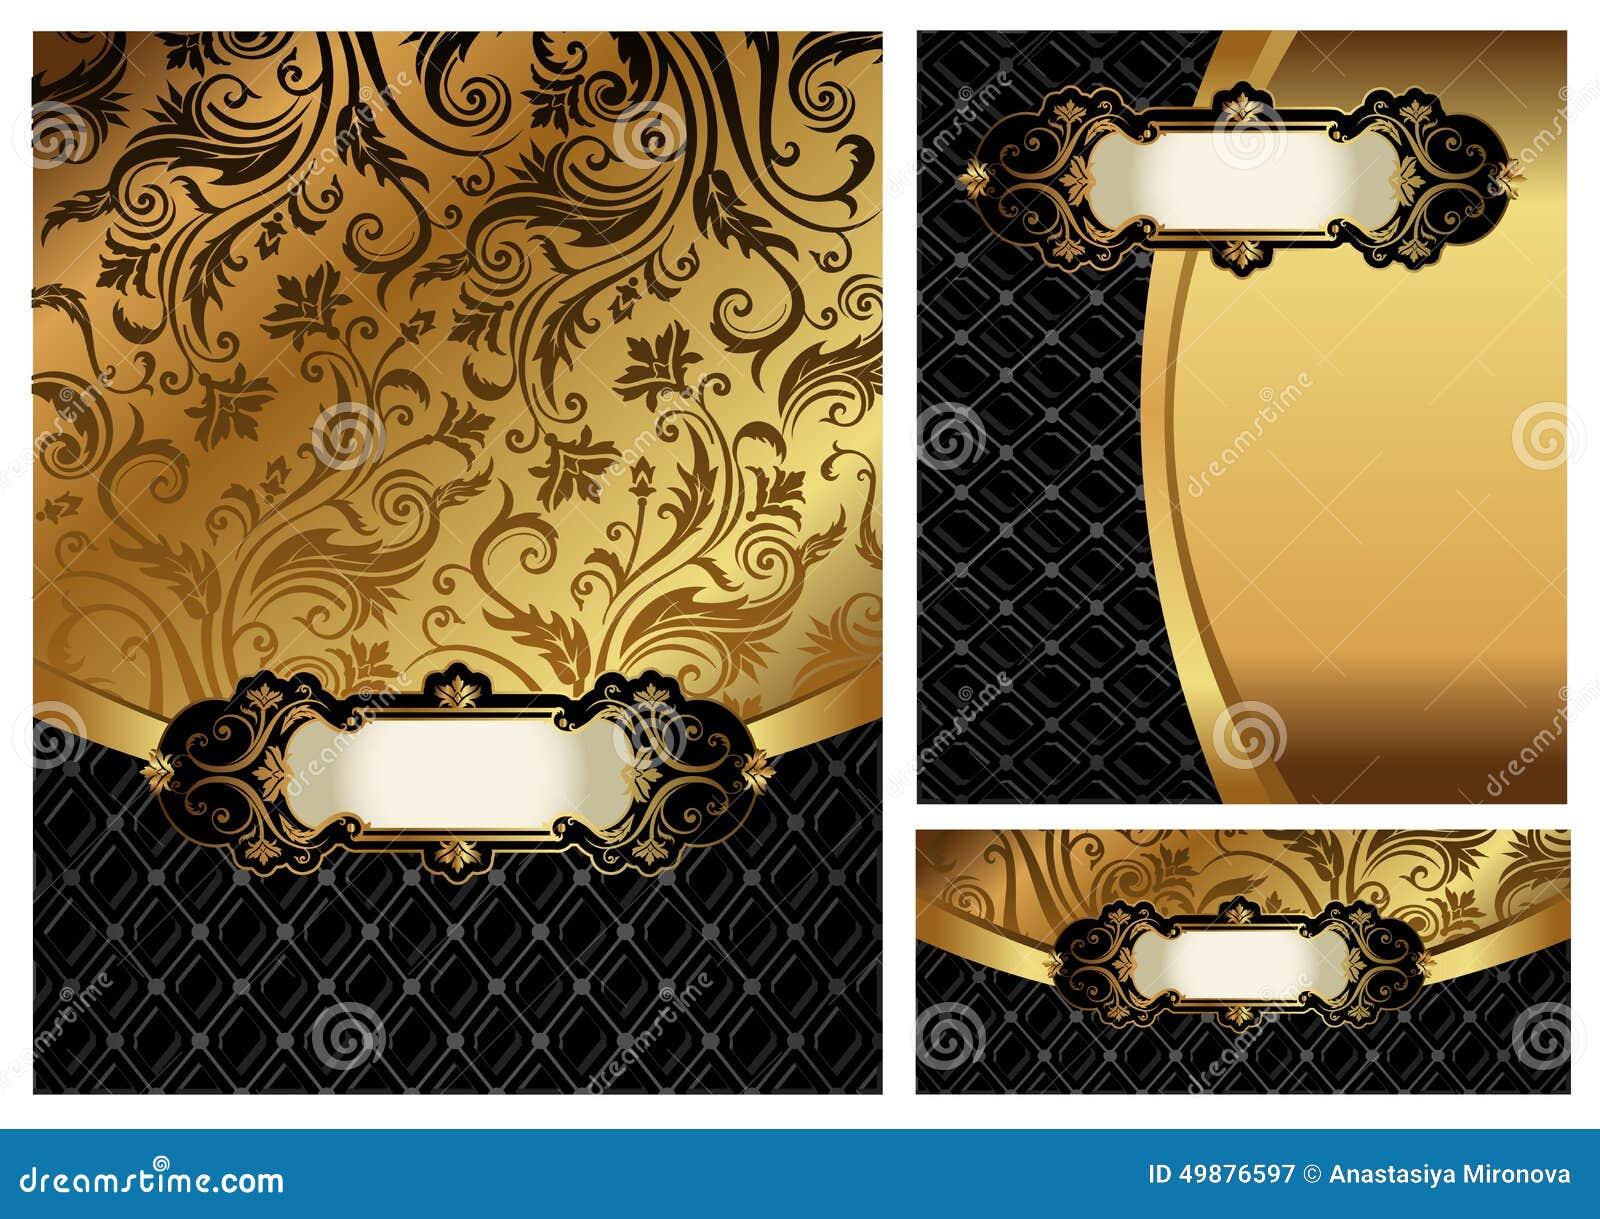 Ornate golden menu cover stock vector. Image of elegant ...